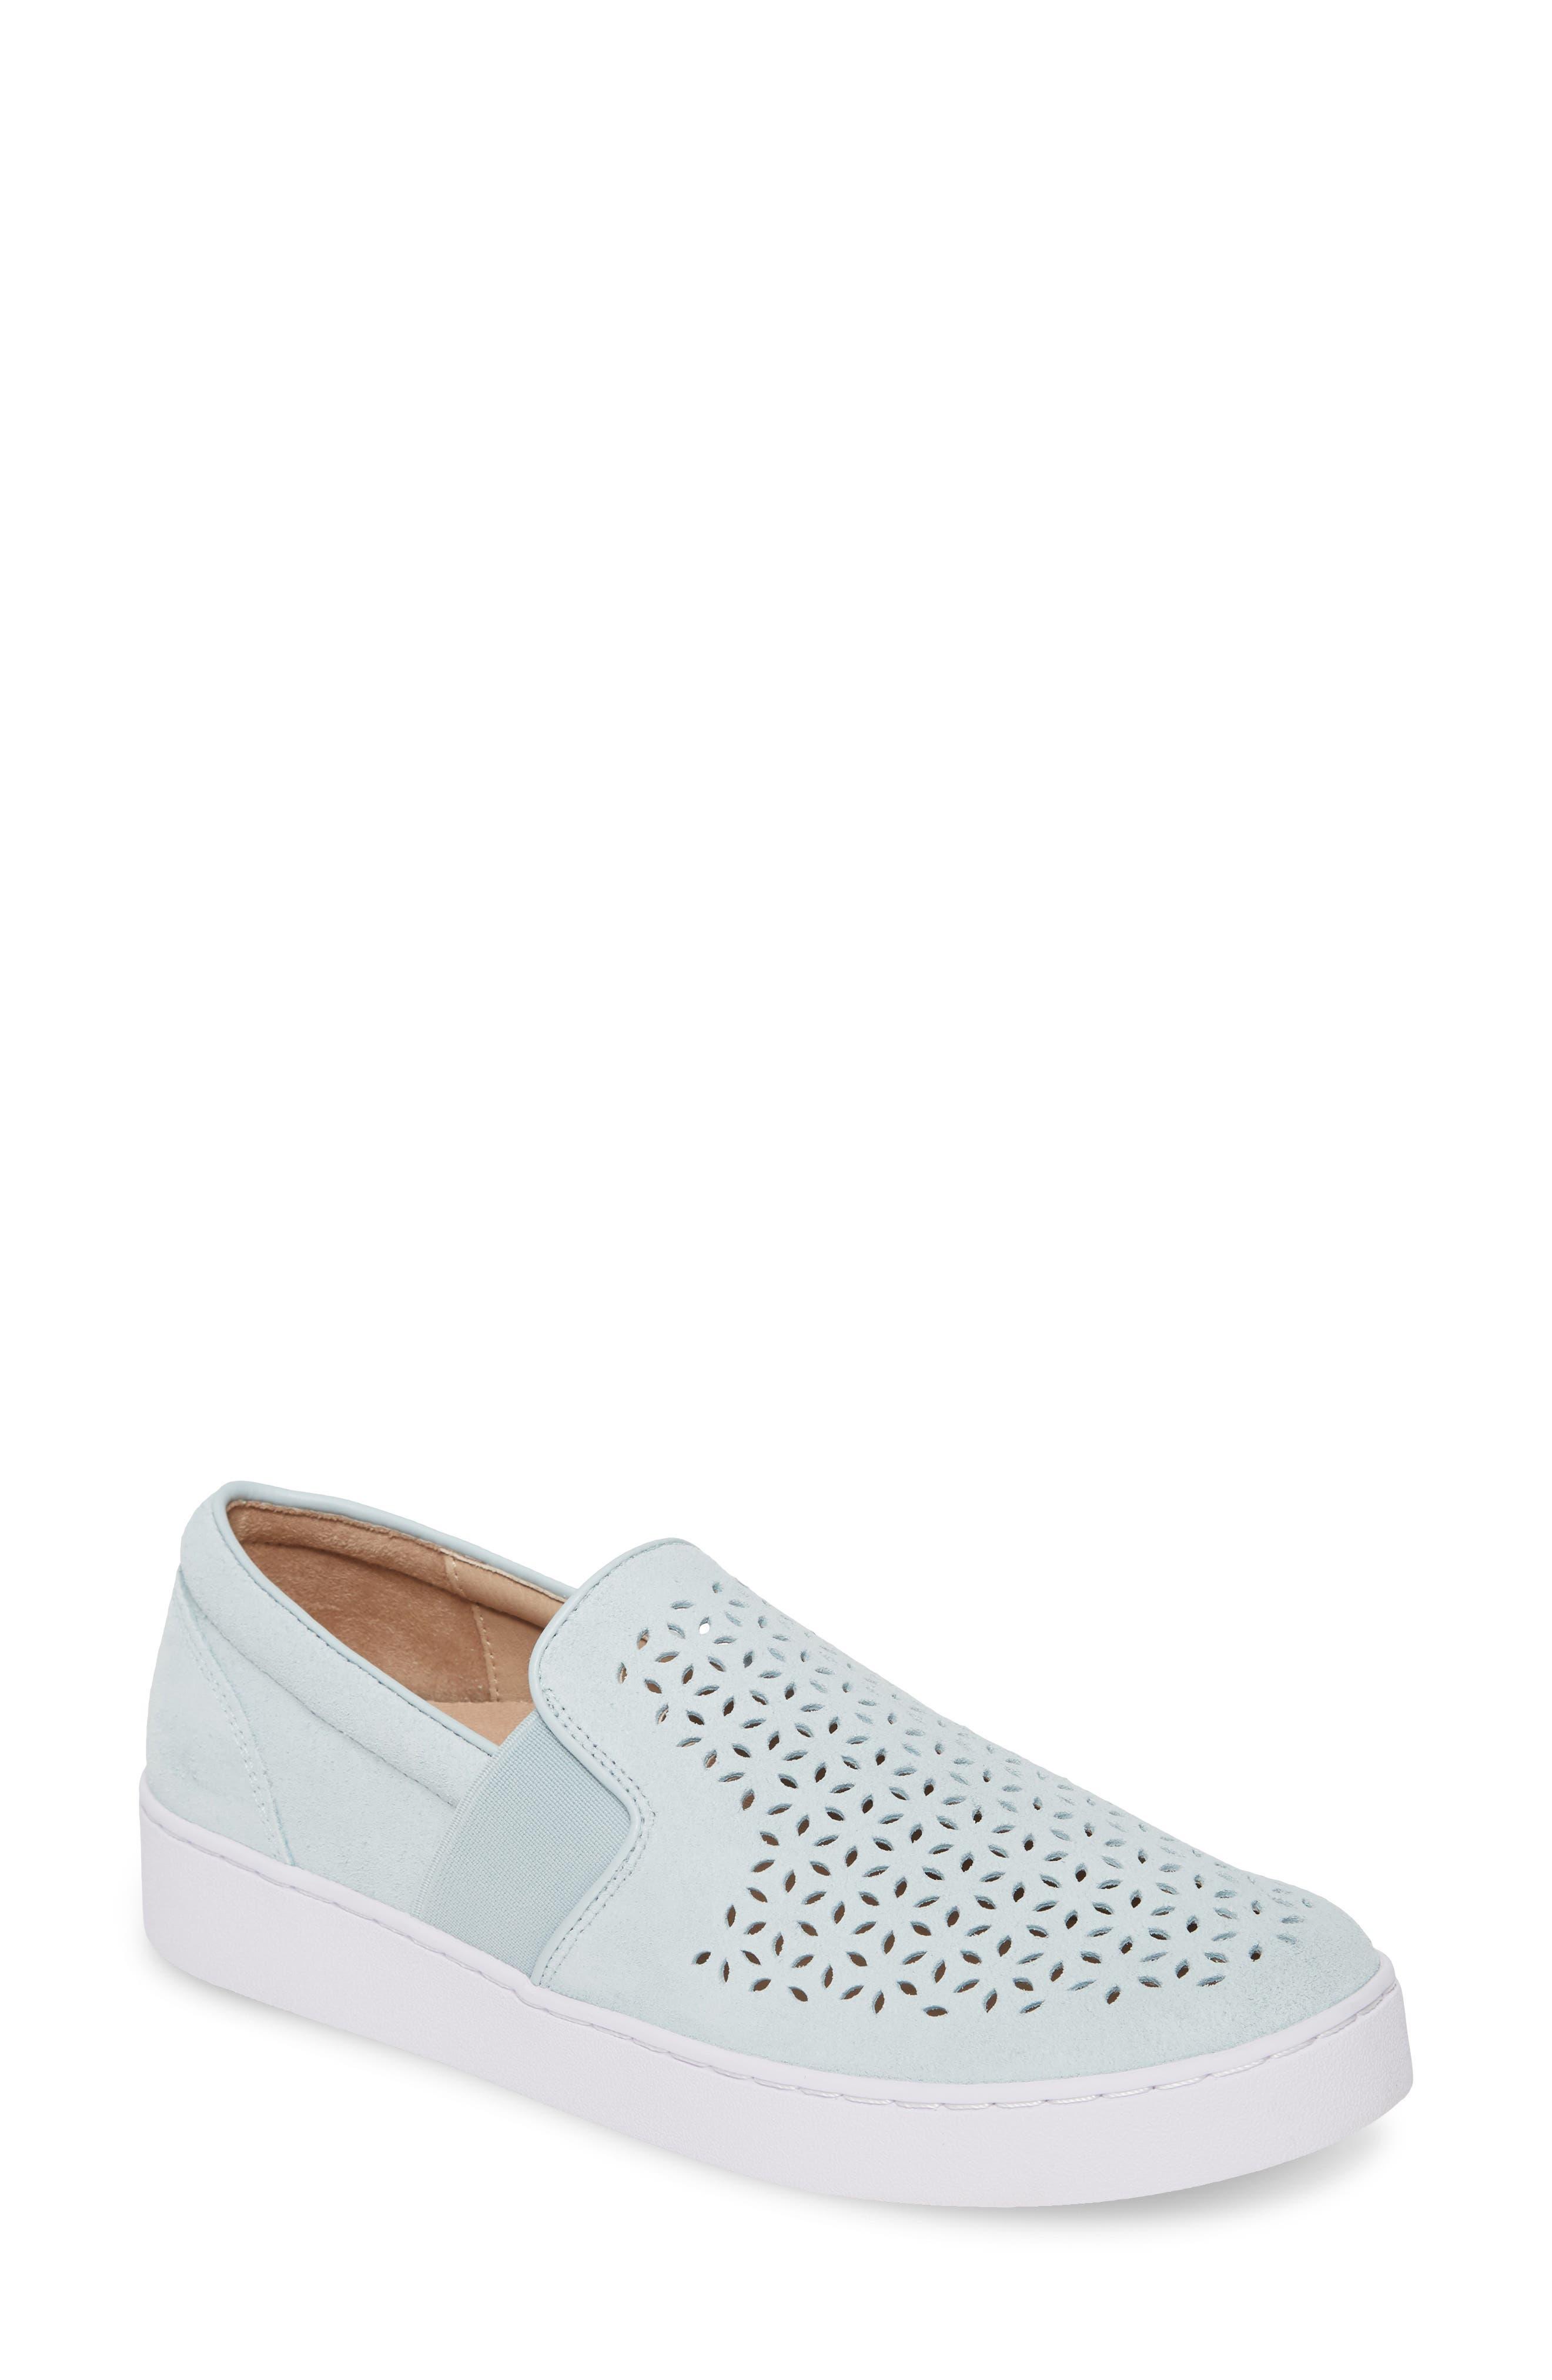 Vionic Kani Perforated Slip-On Sneaker- Blue